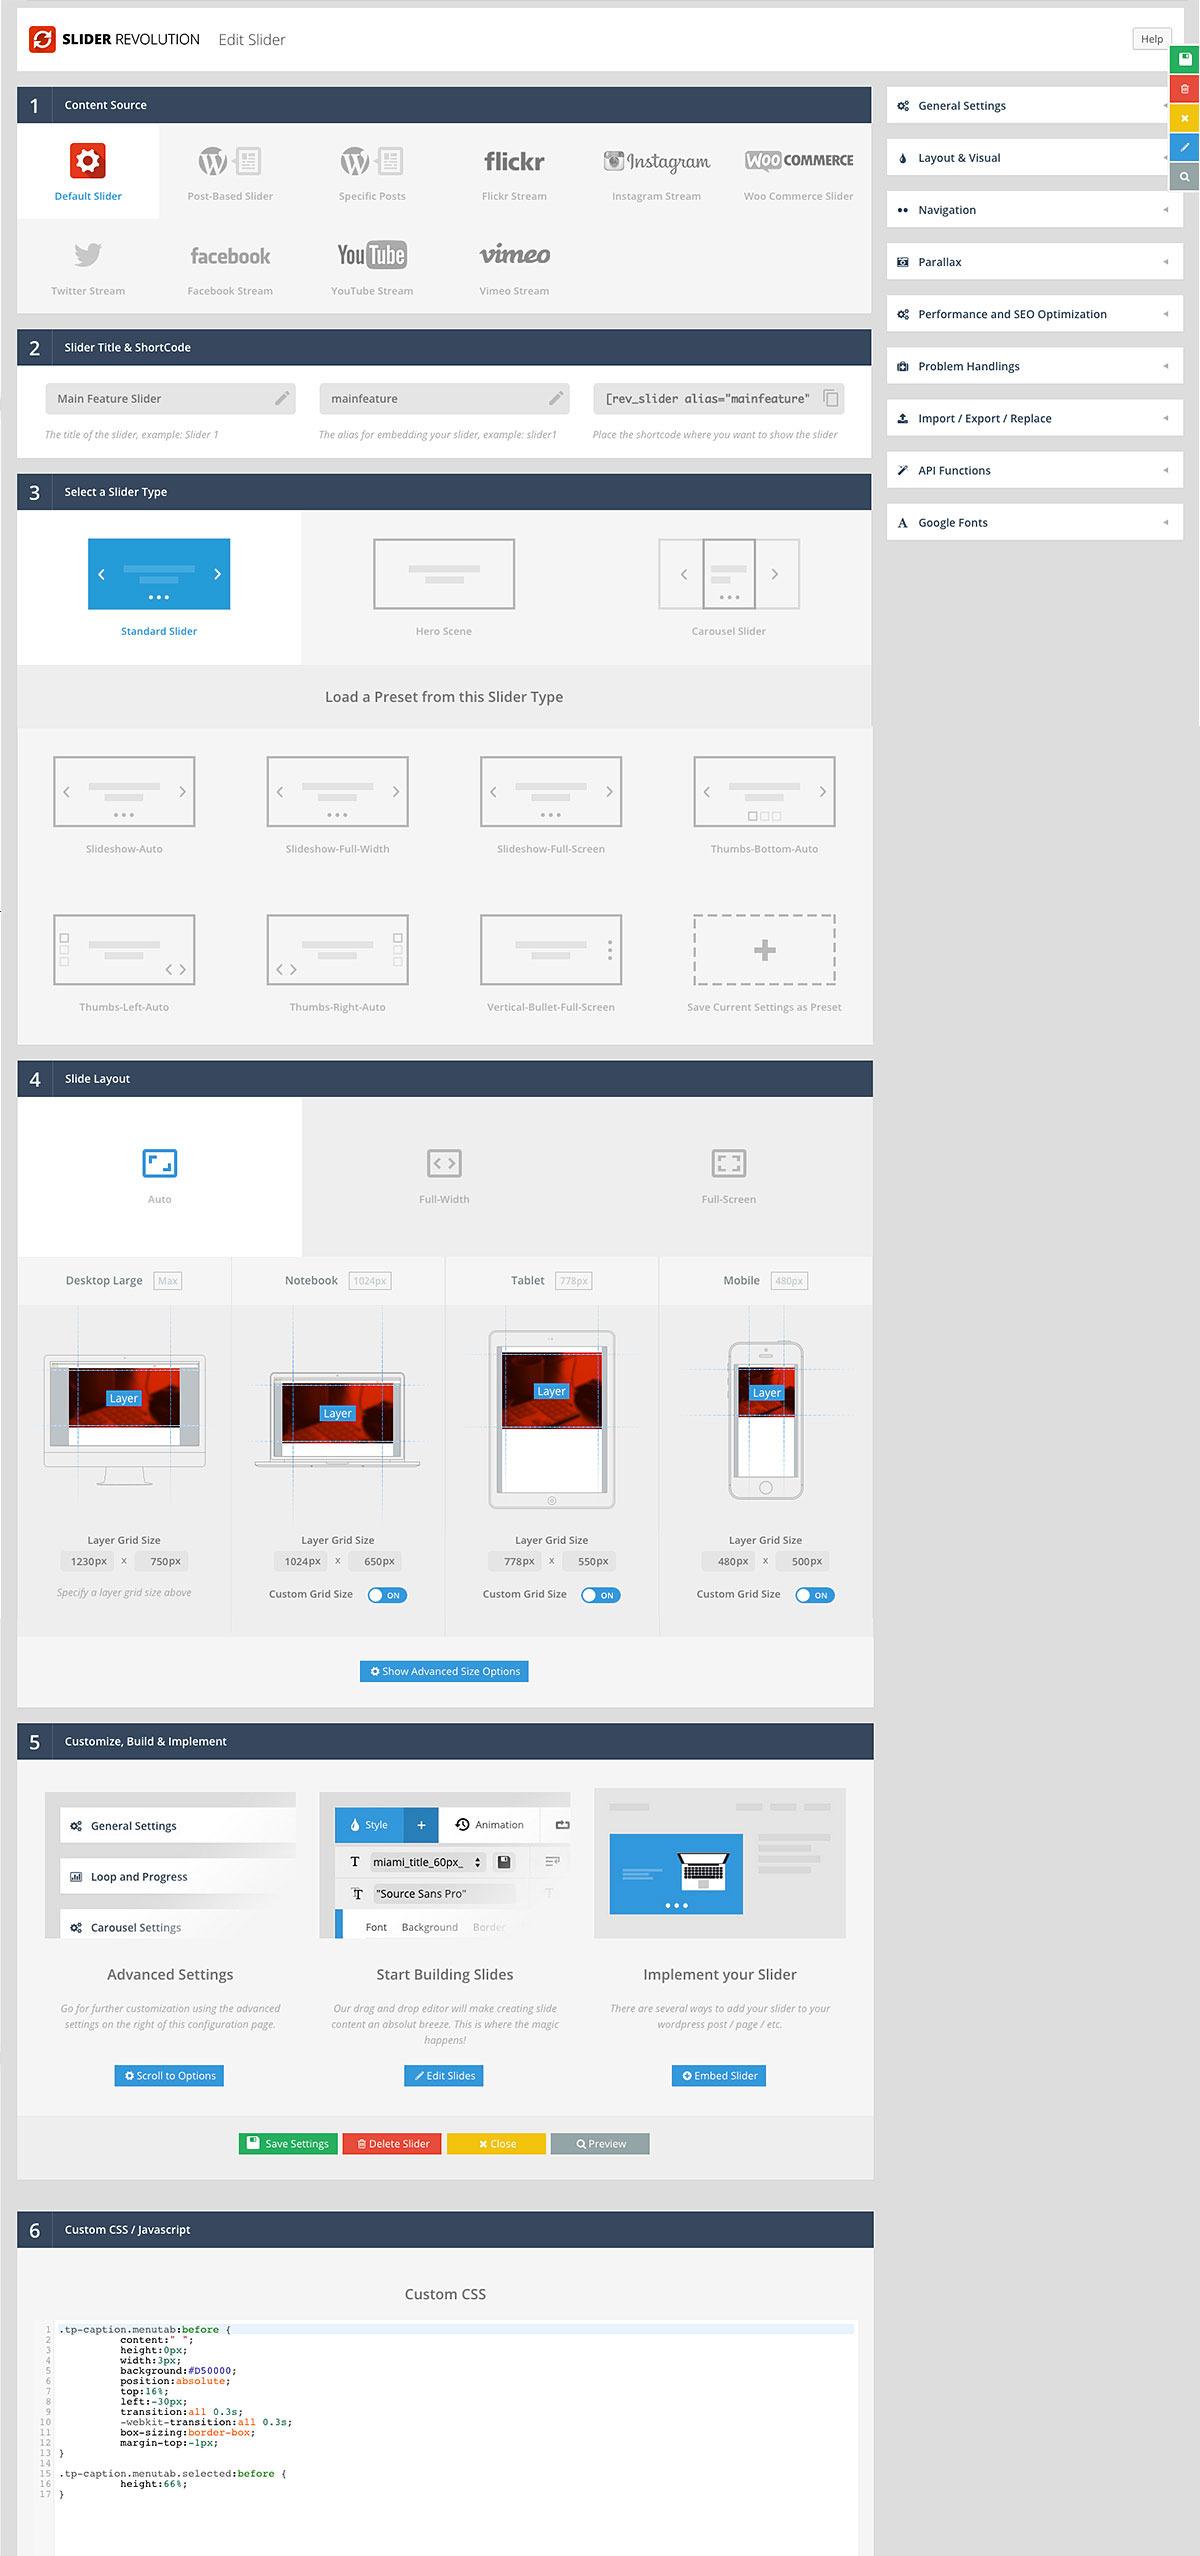 How to make revolution slider responsive in wordpress